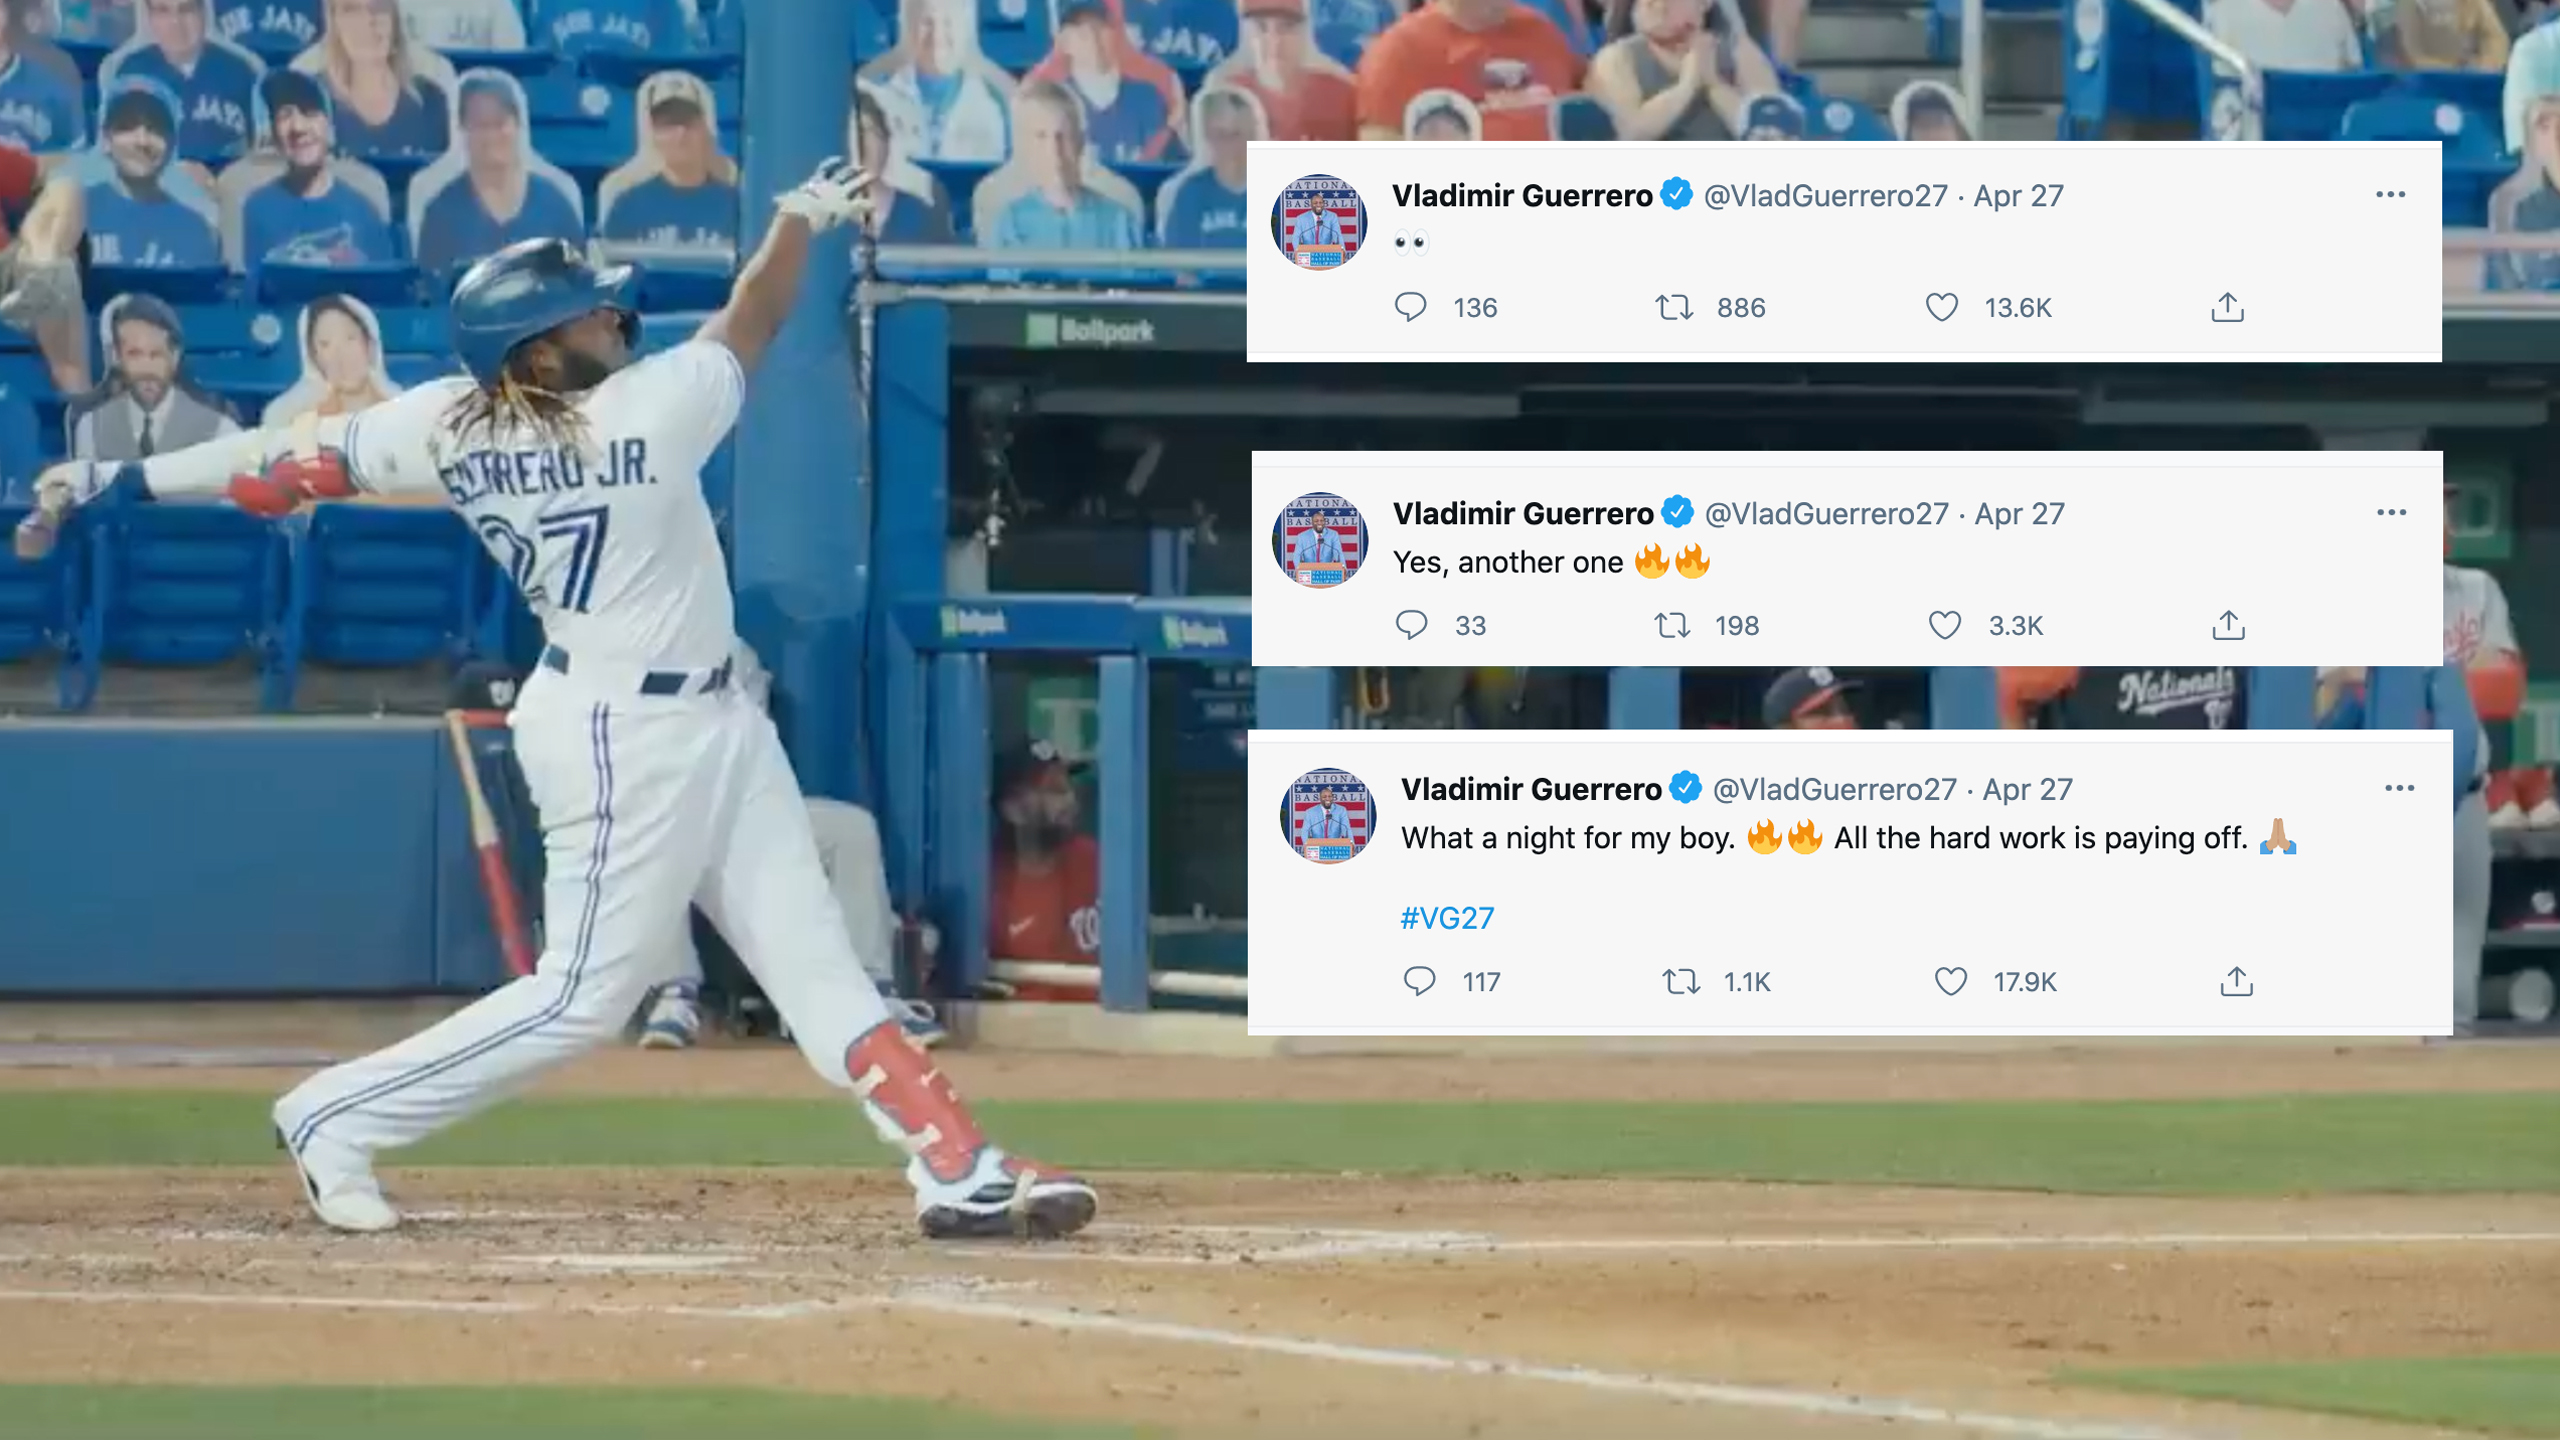 Vlad Guerrero Jr. Impresses his Dad with Home Run Display